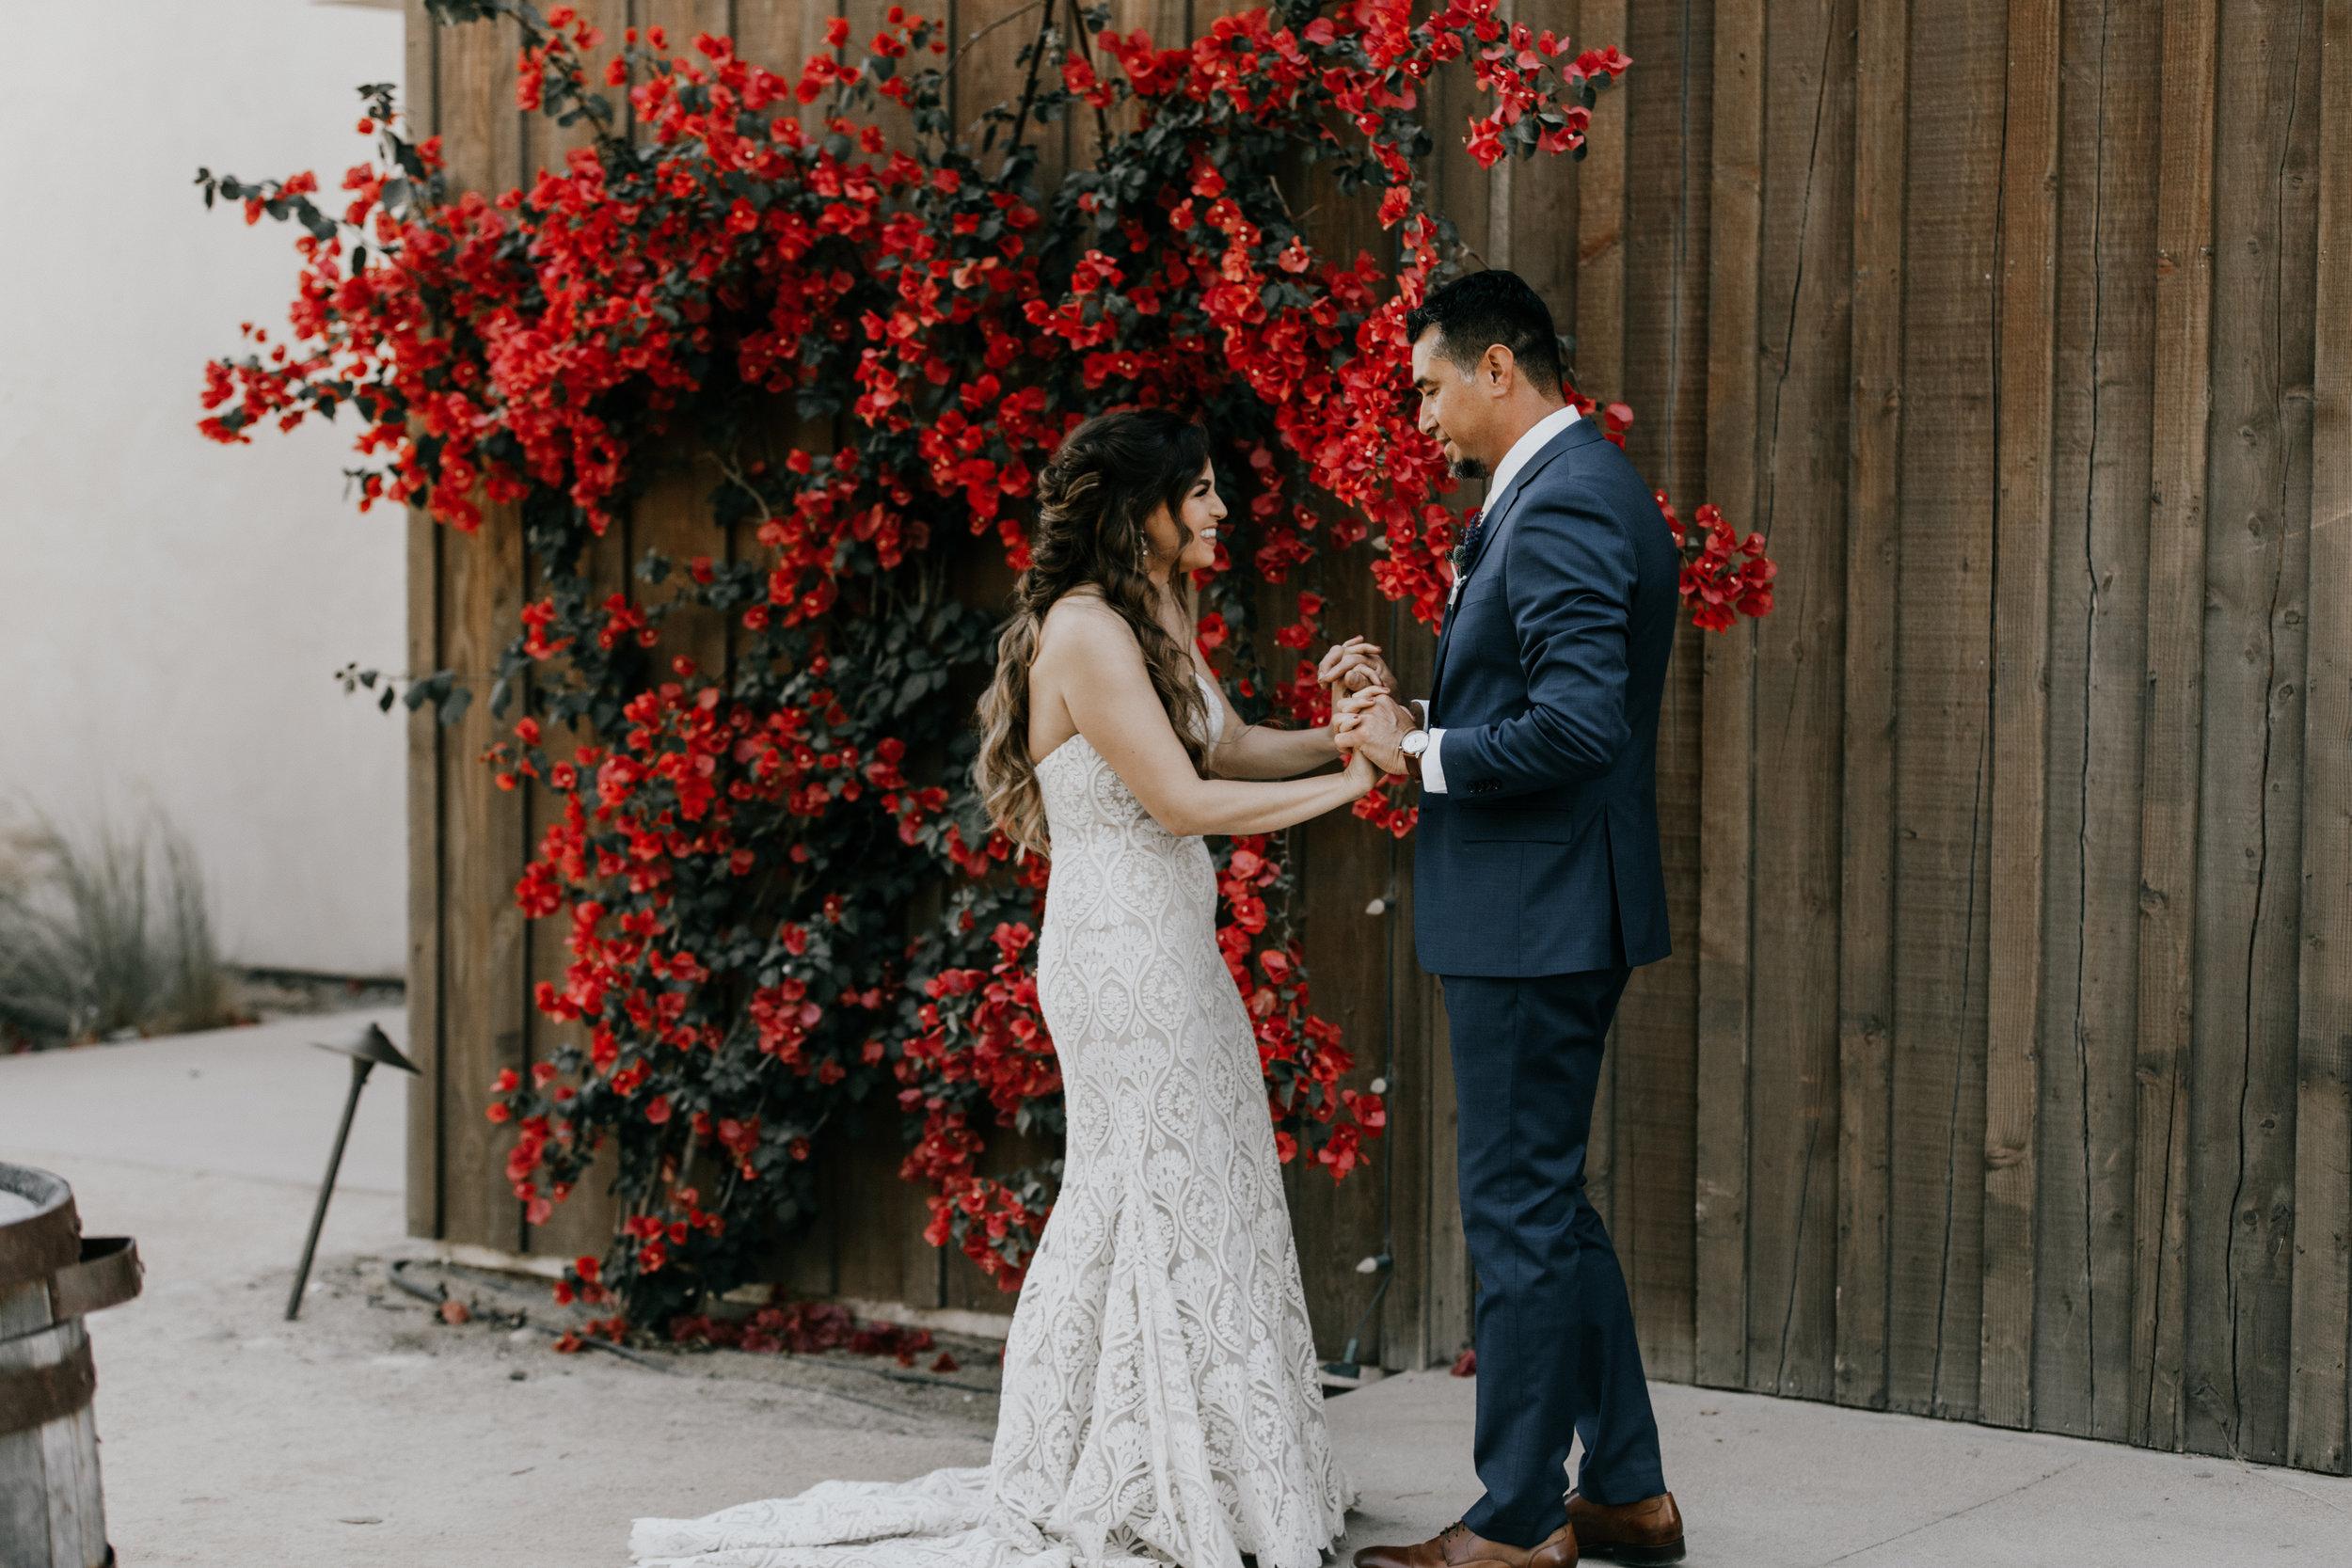 WeddingphotographyTemecula.jpg